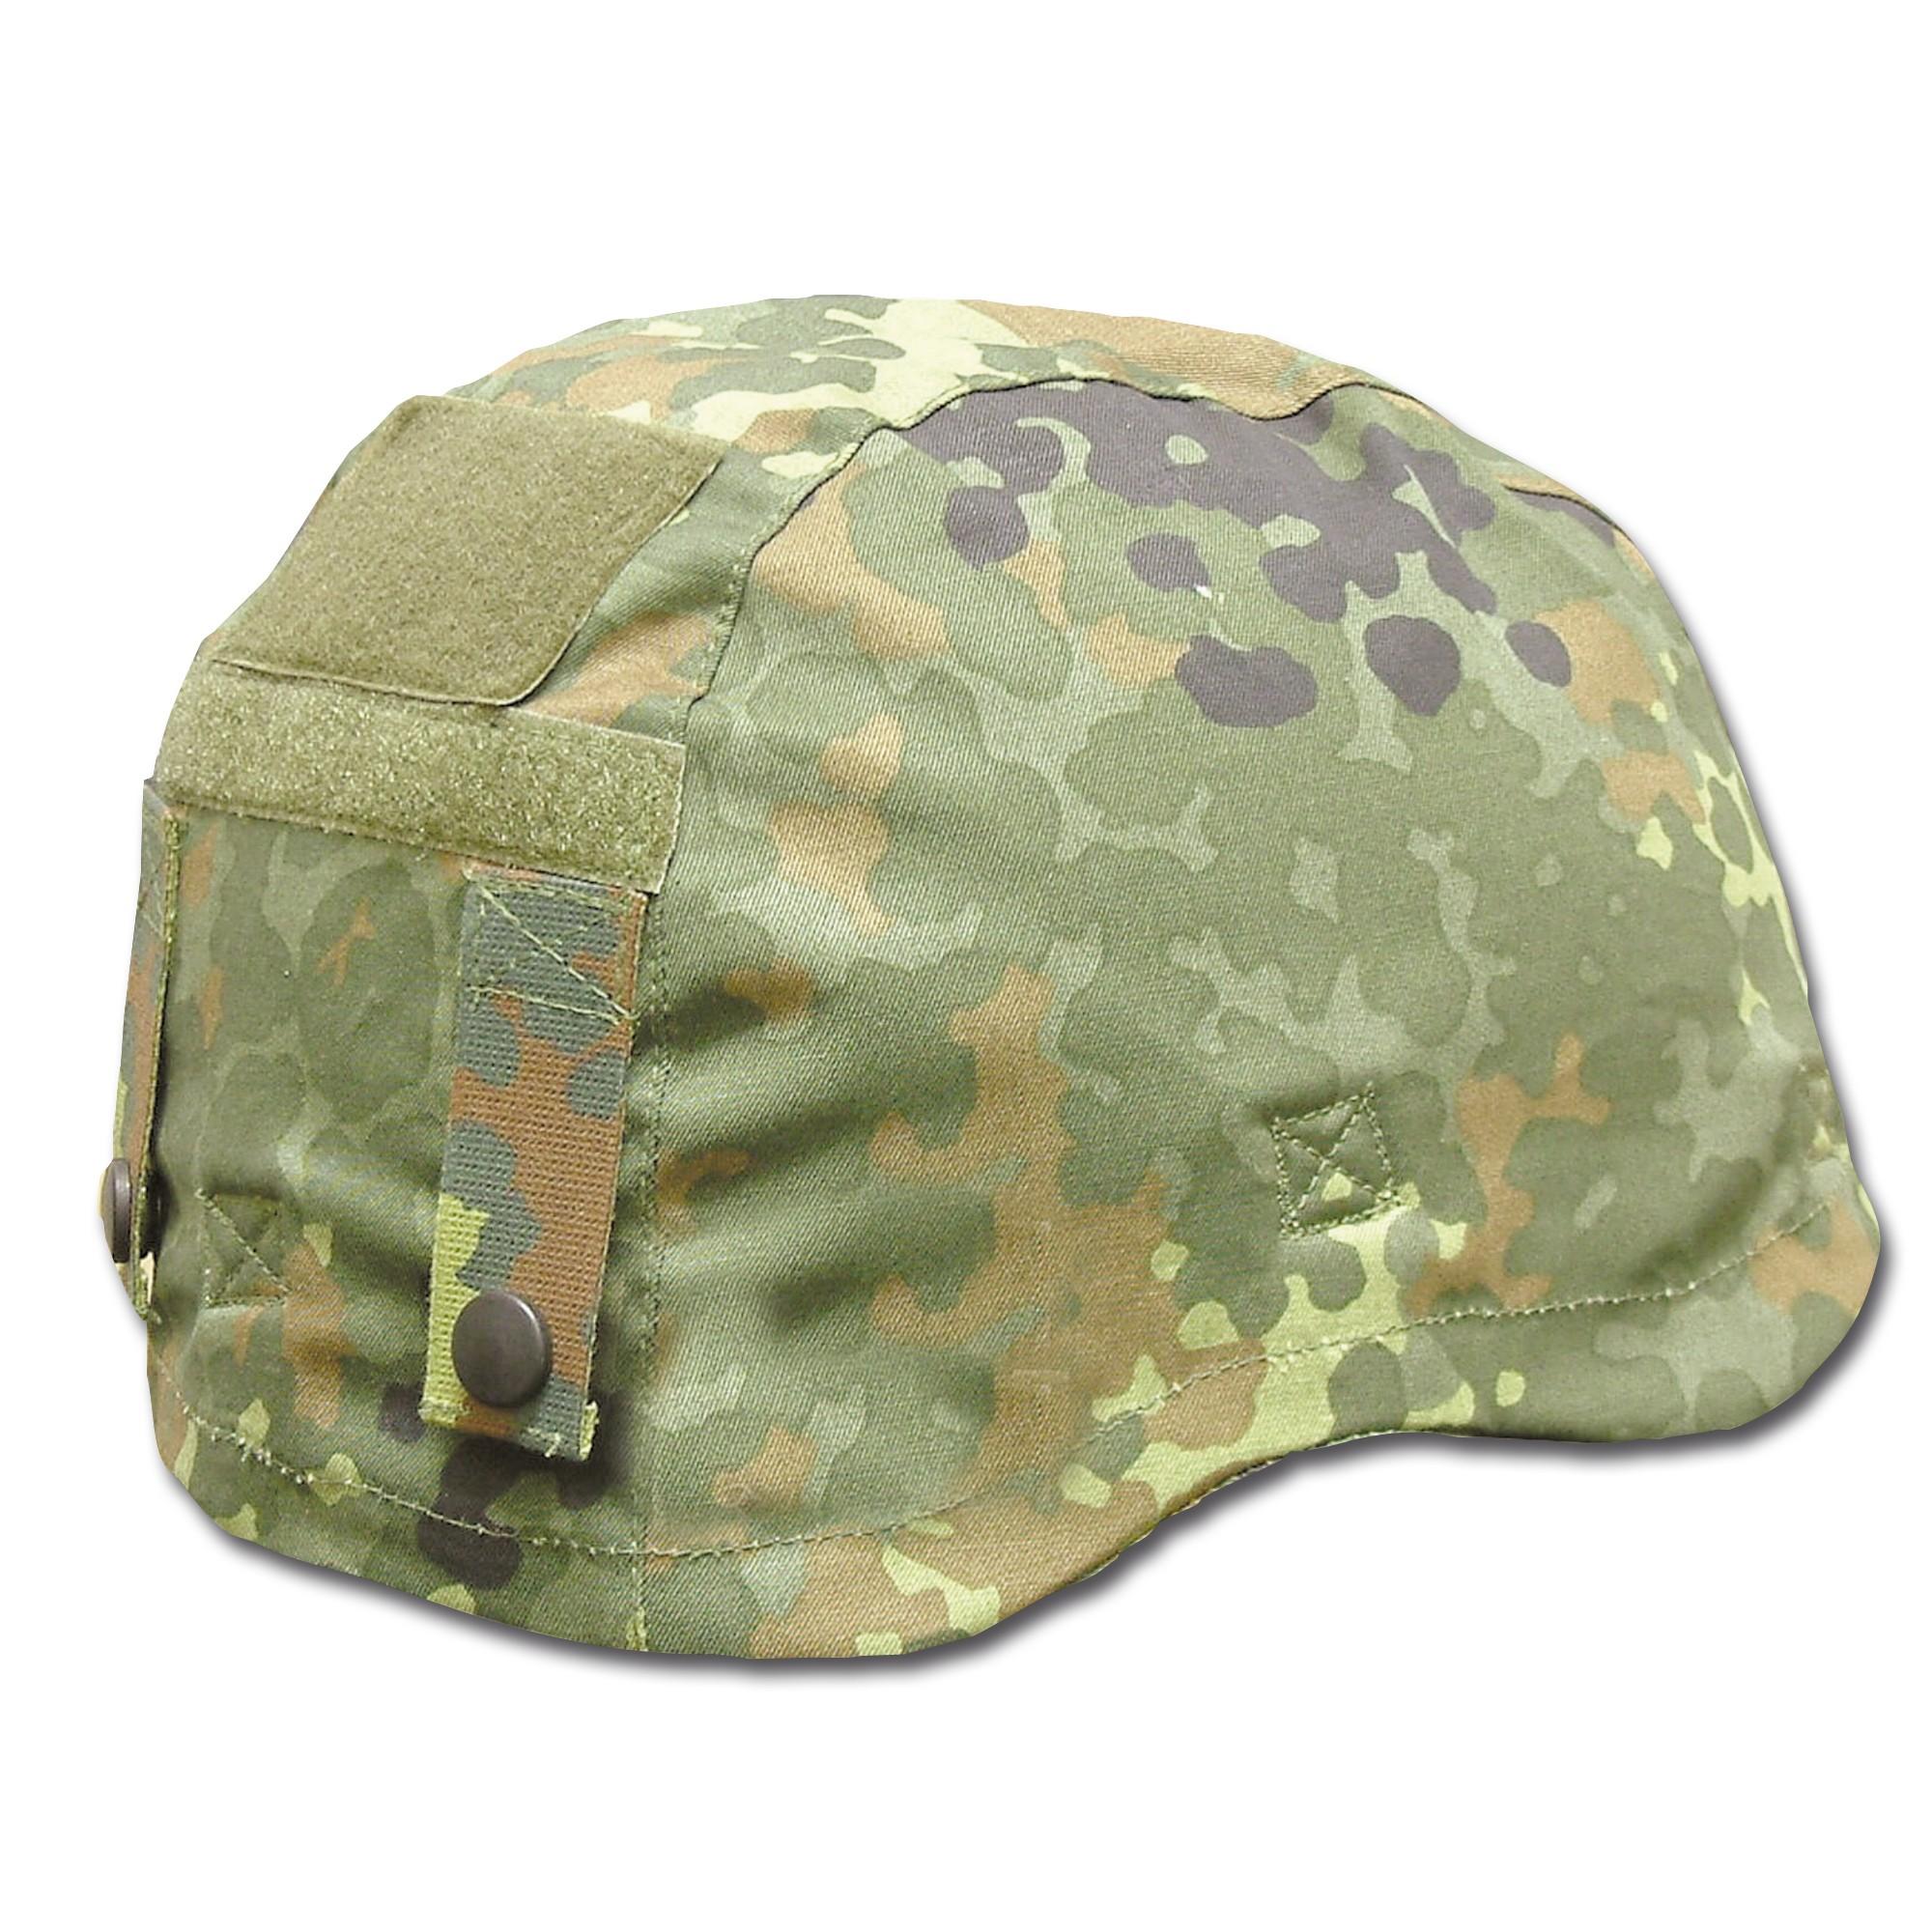 Helmbezug Protec ClassicCut flecktarn